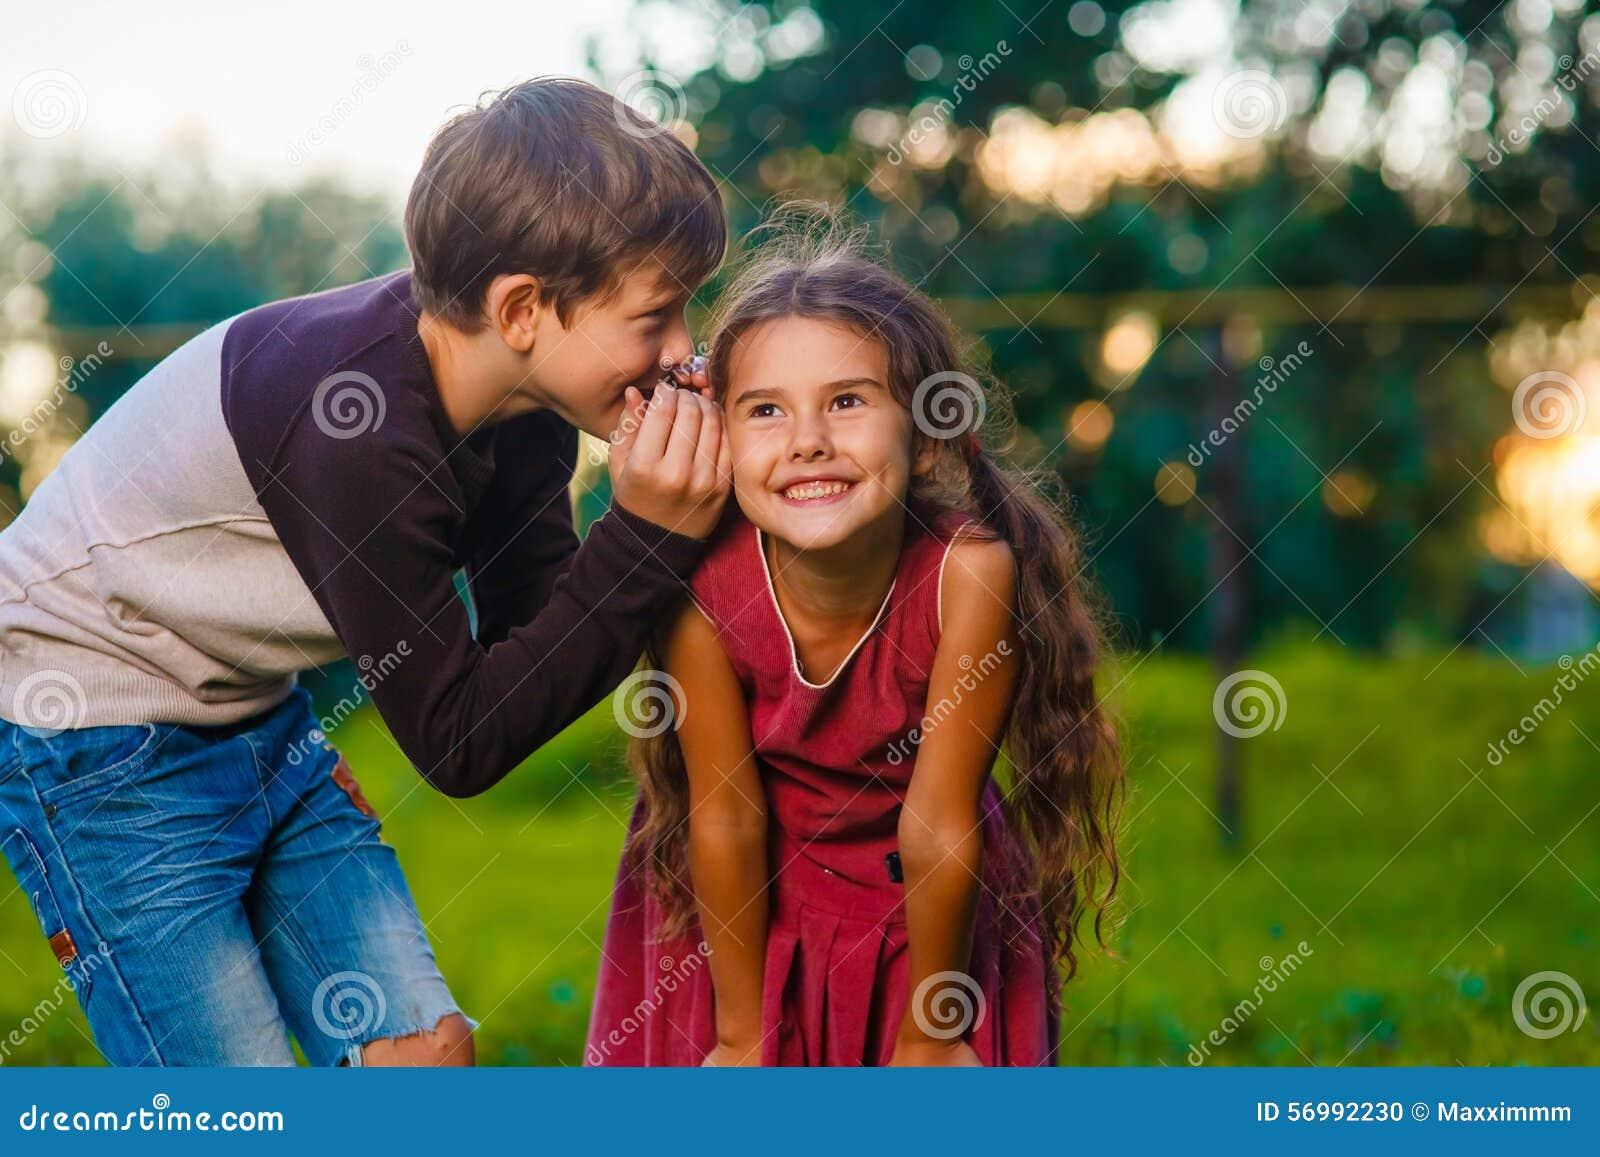 Teen boy whispering secret gossip girl child s ear